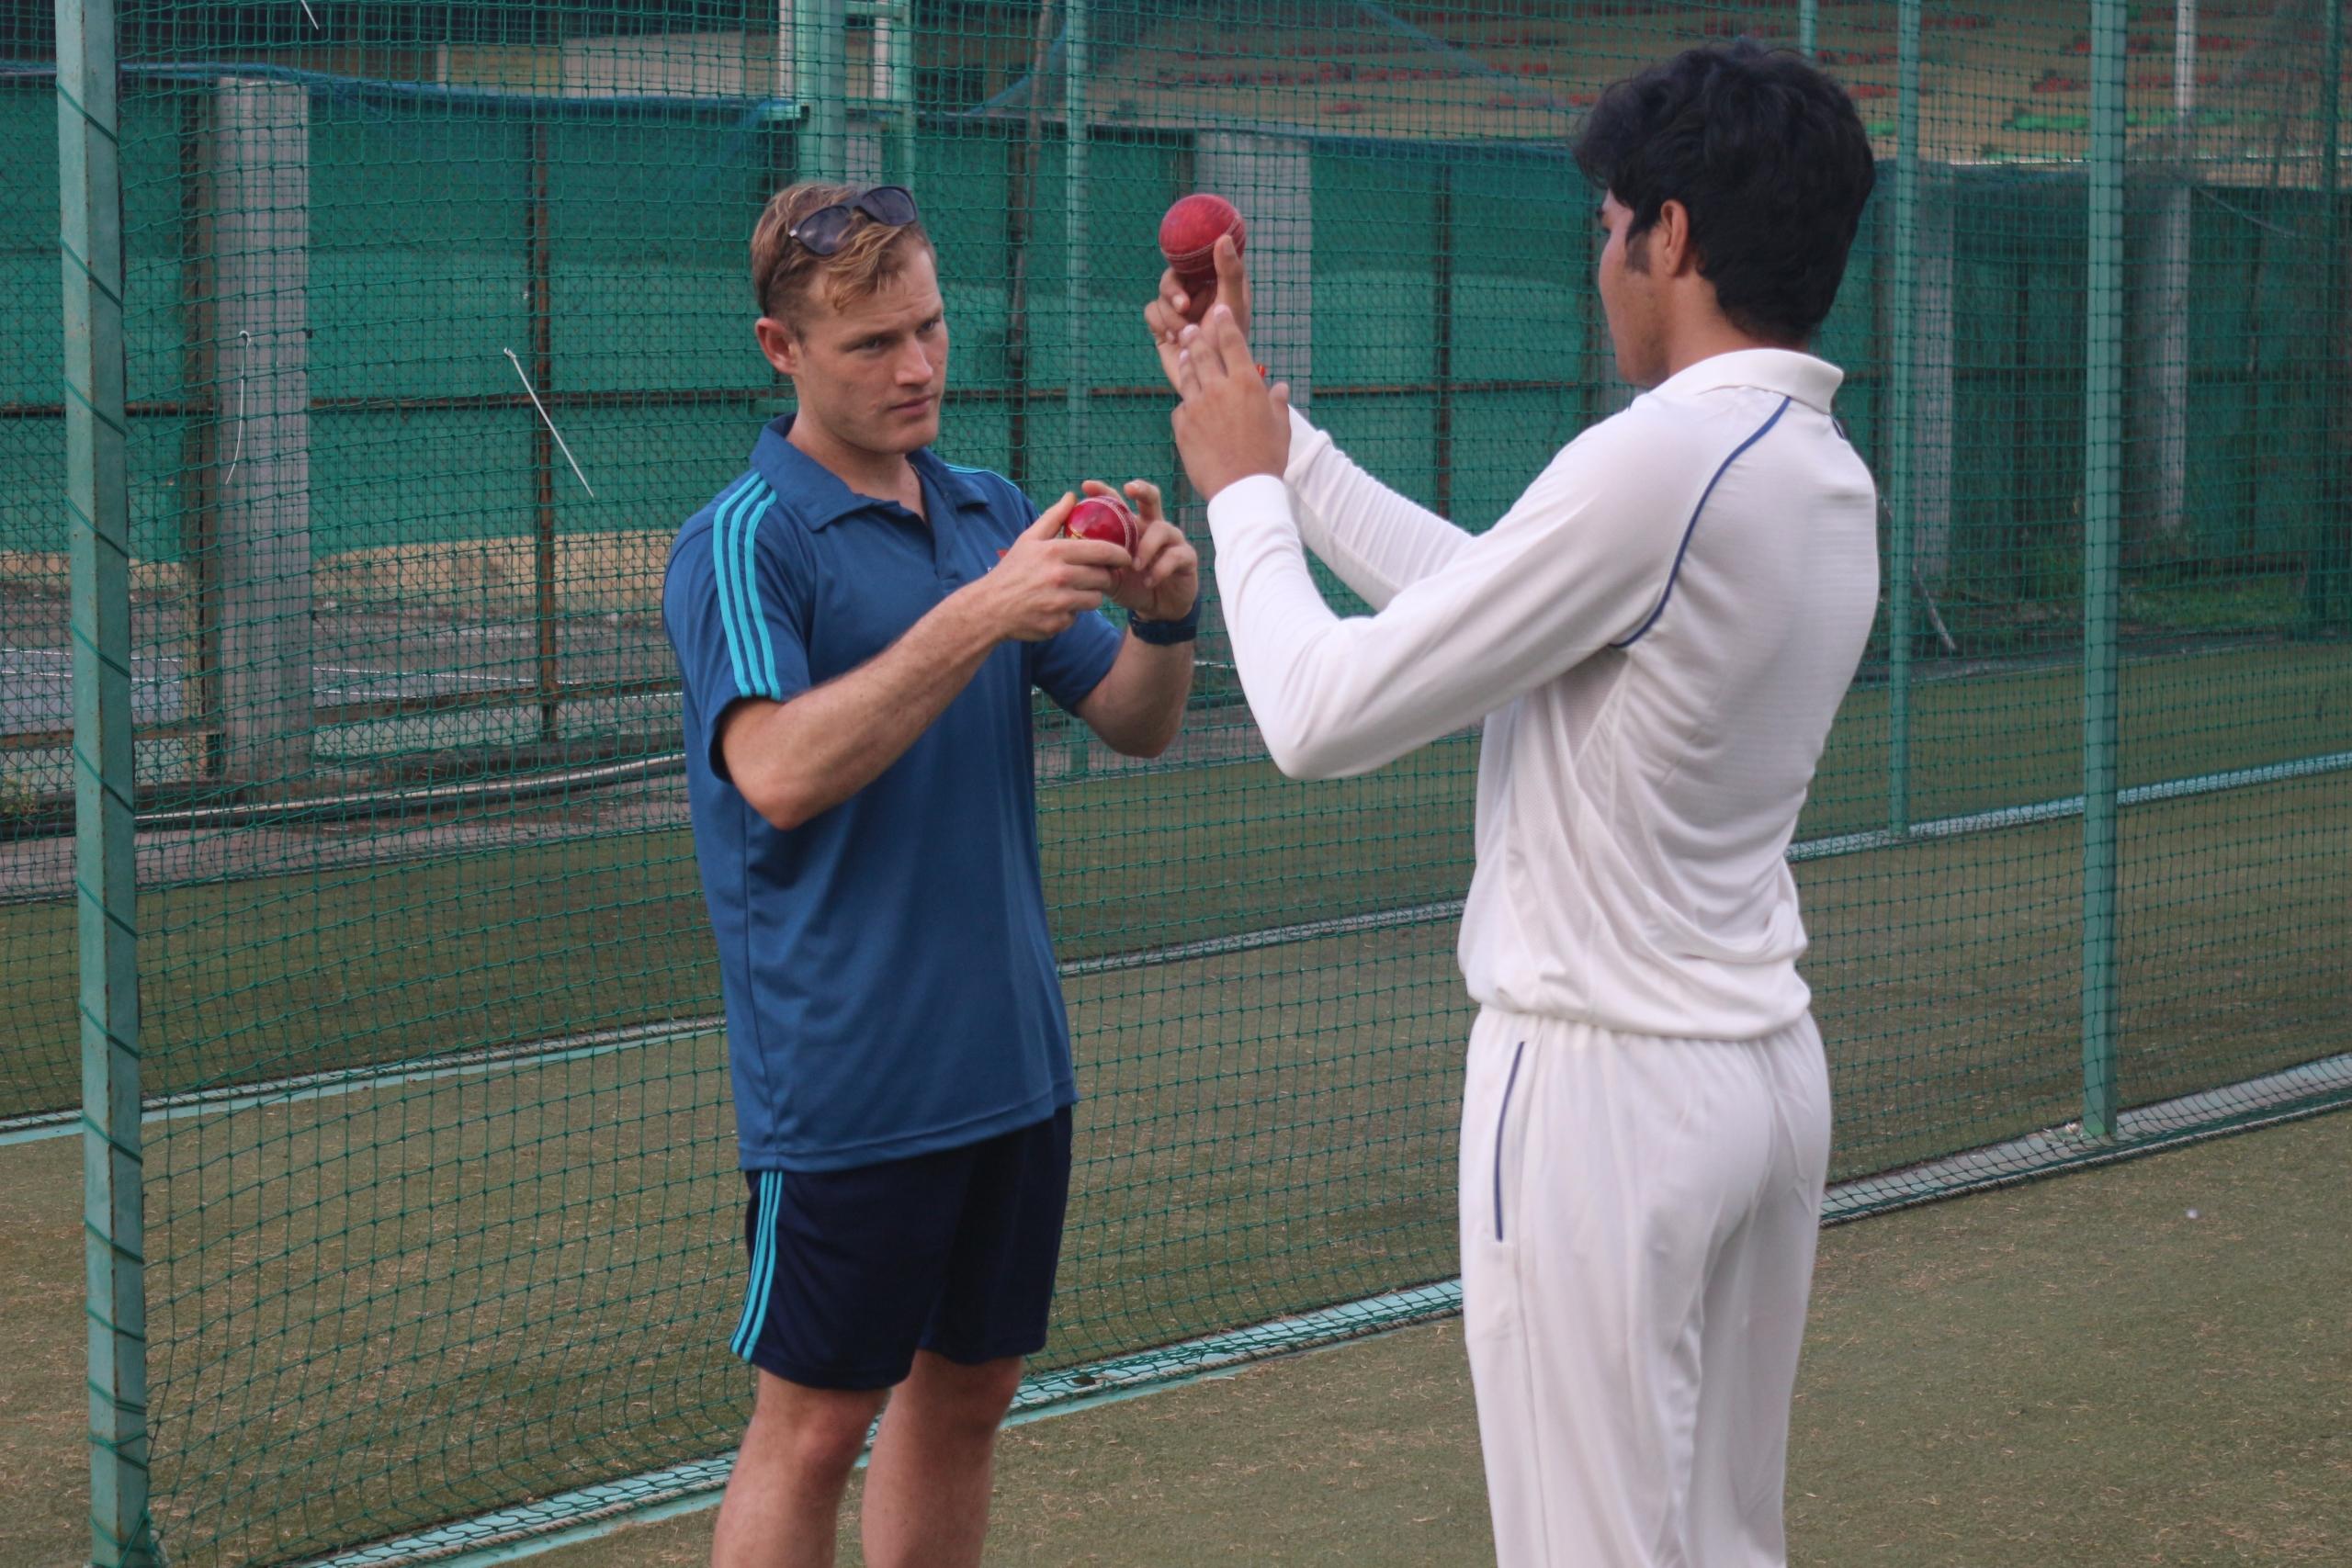 Coach Daniel - Cricket Coach At GKCI